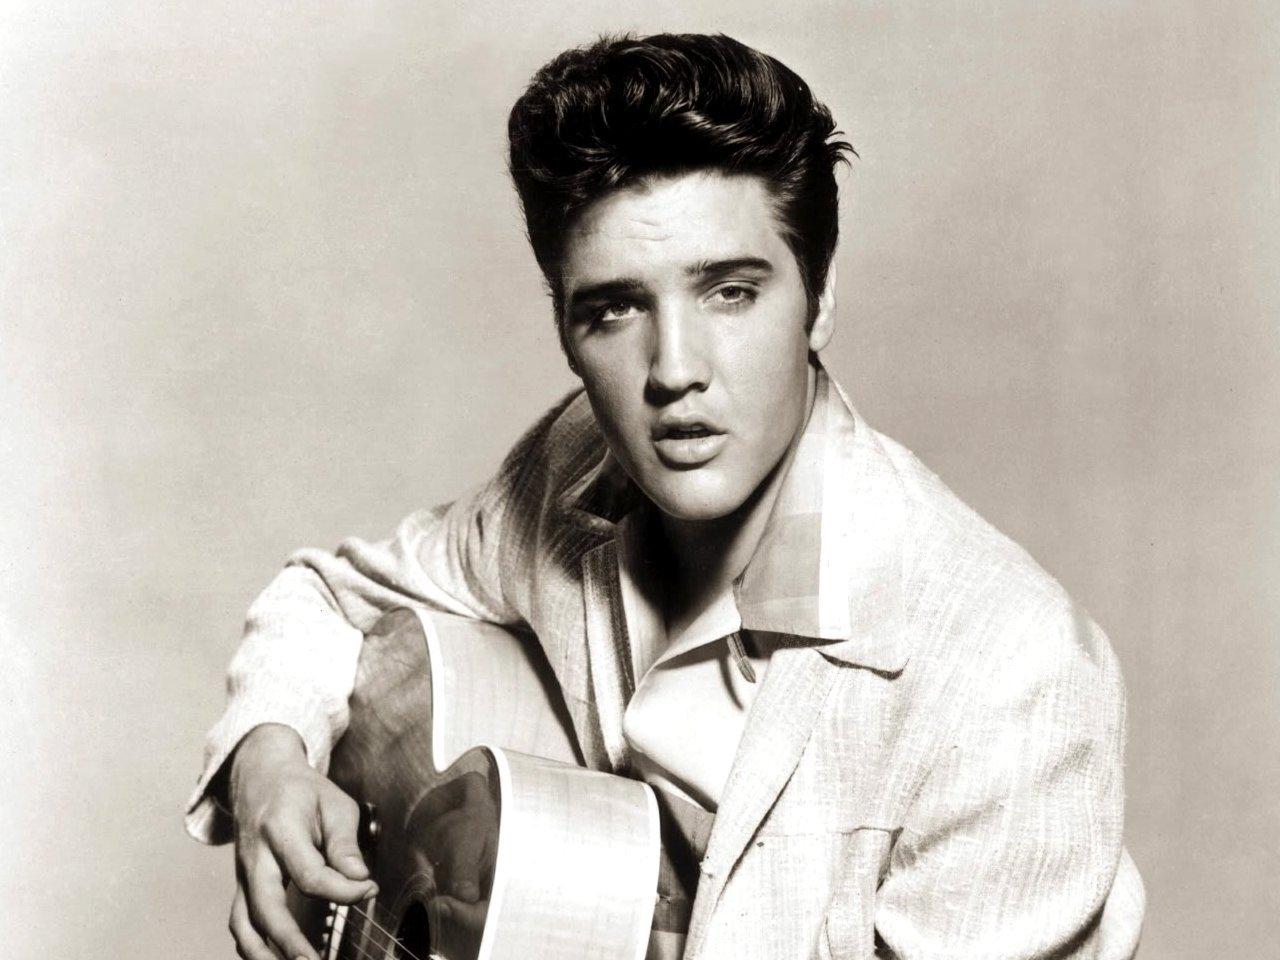 Elvis Presley 009 10 Things You Didn't Know About Elvis Presley